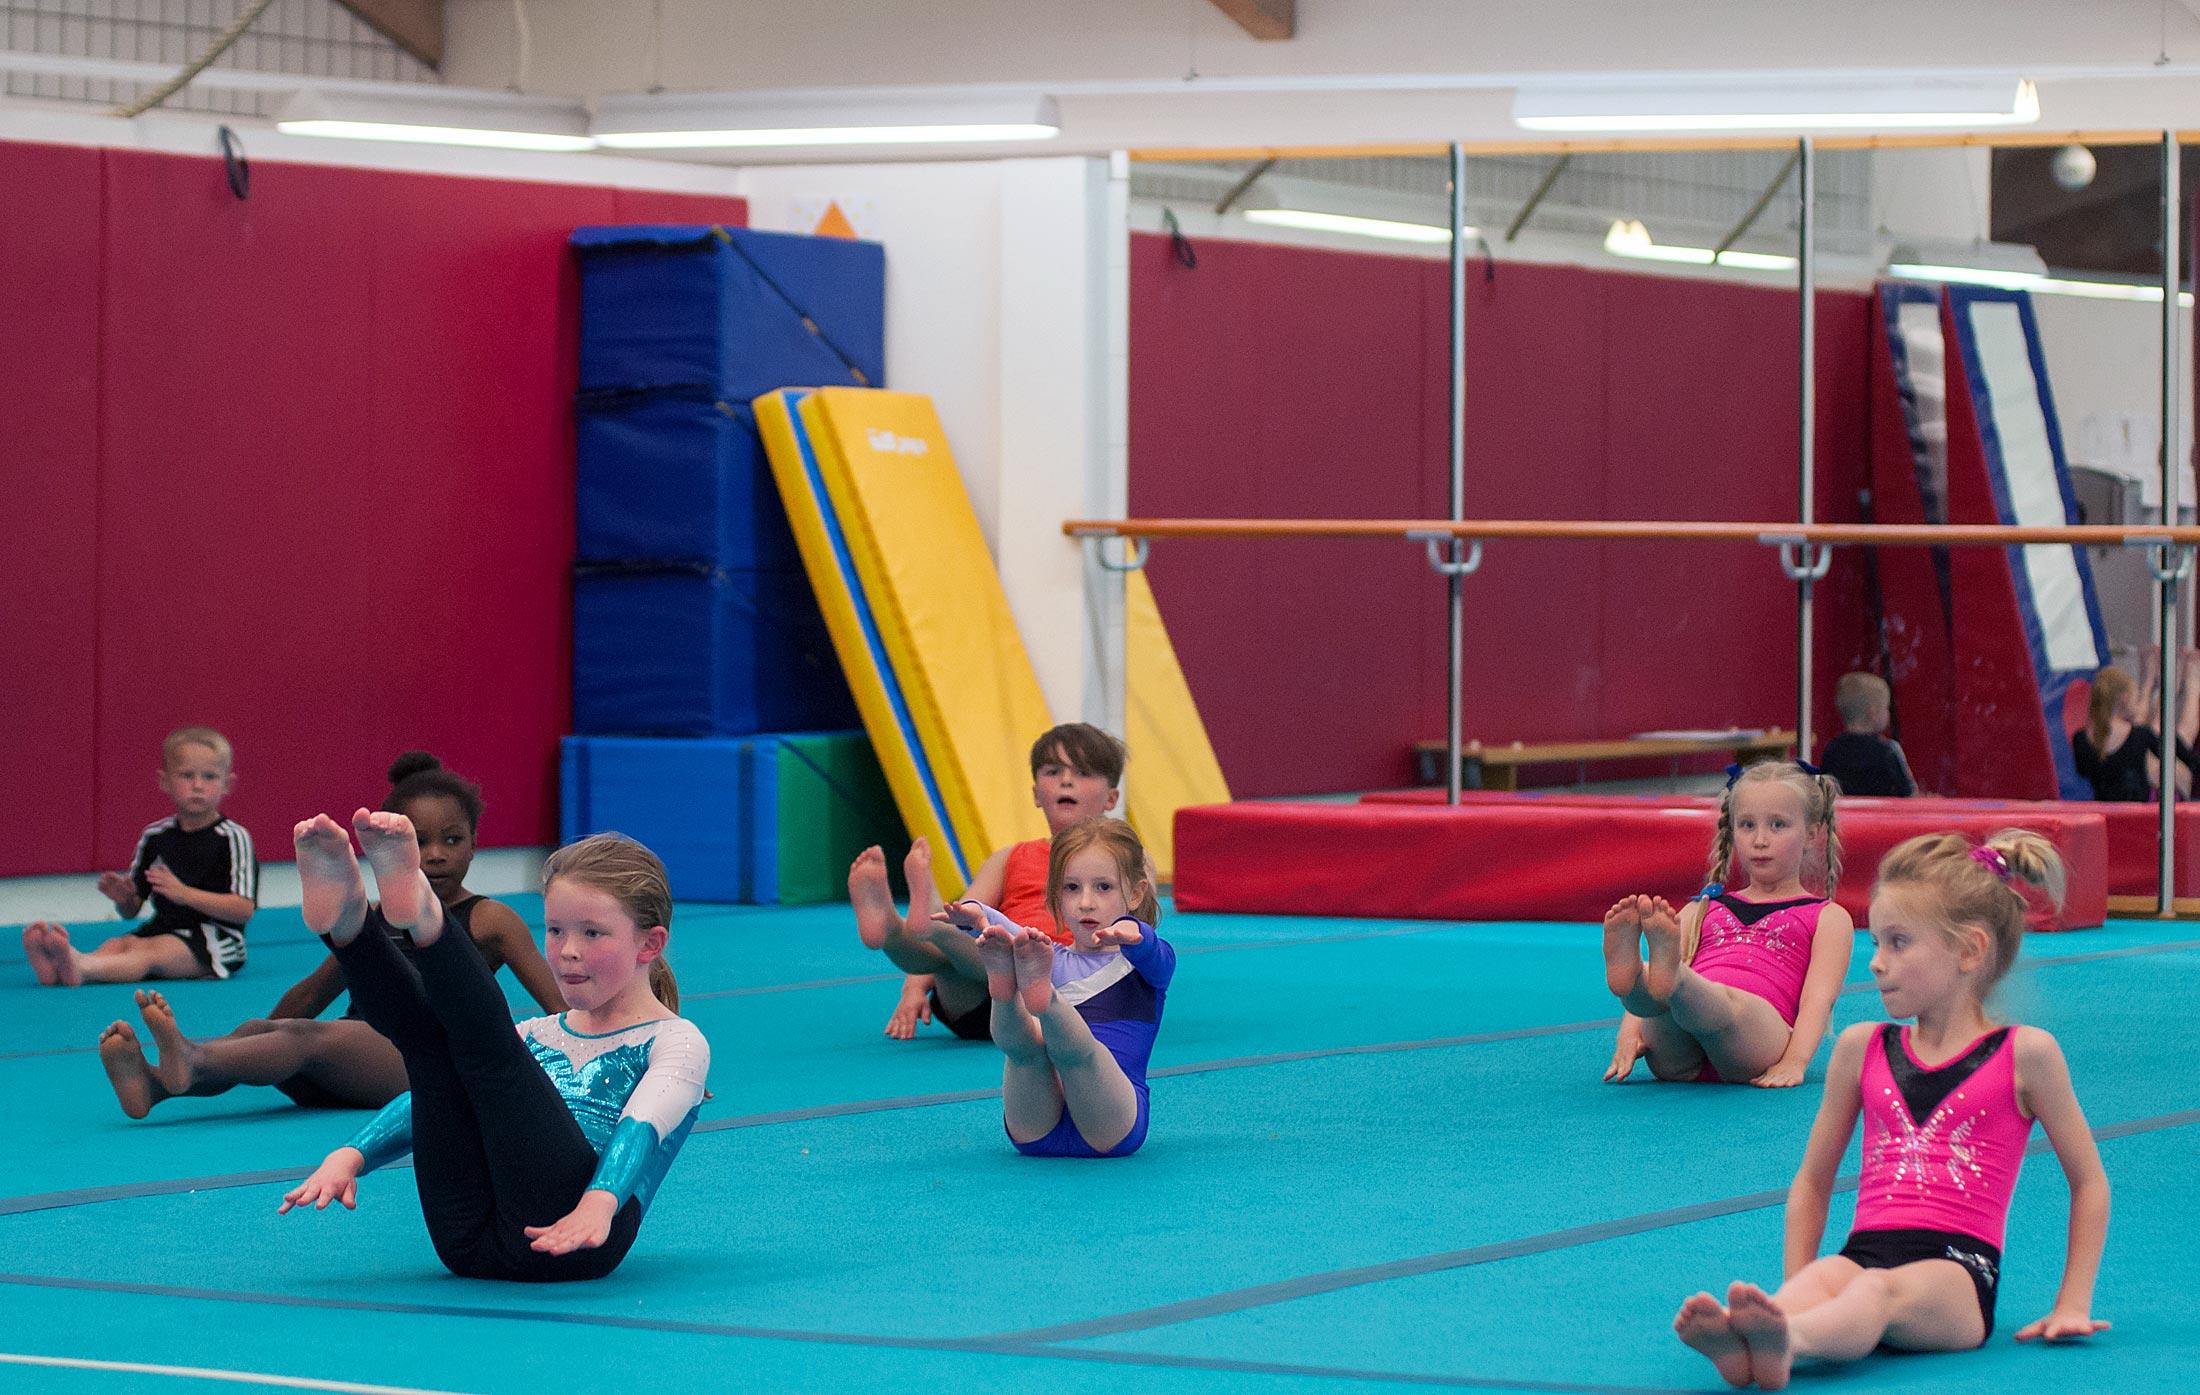 gymnasts in class raising legs